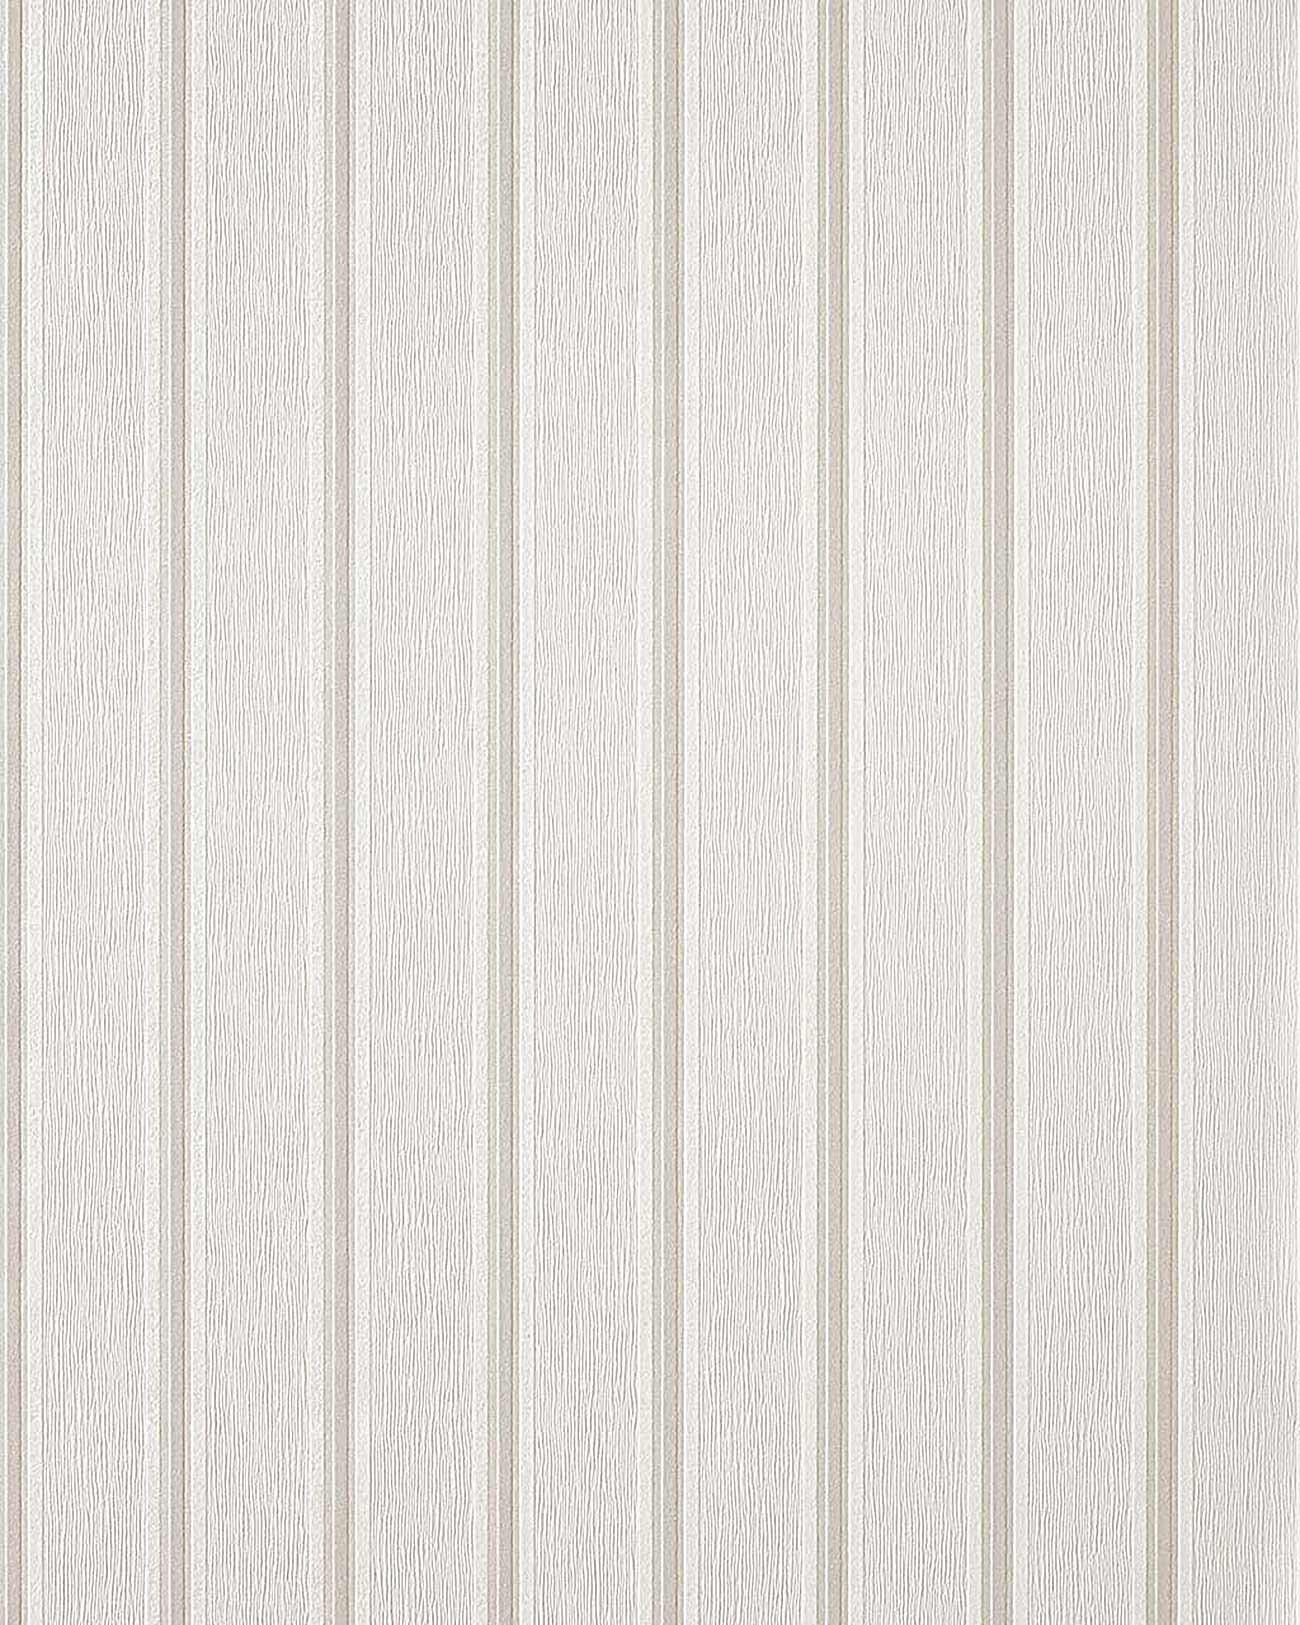 Grey backgrounds marketing wallpaper wallpapersafari for Grey and cream wallpaper